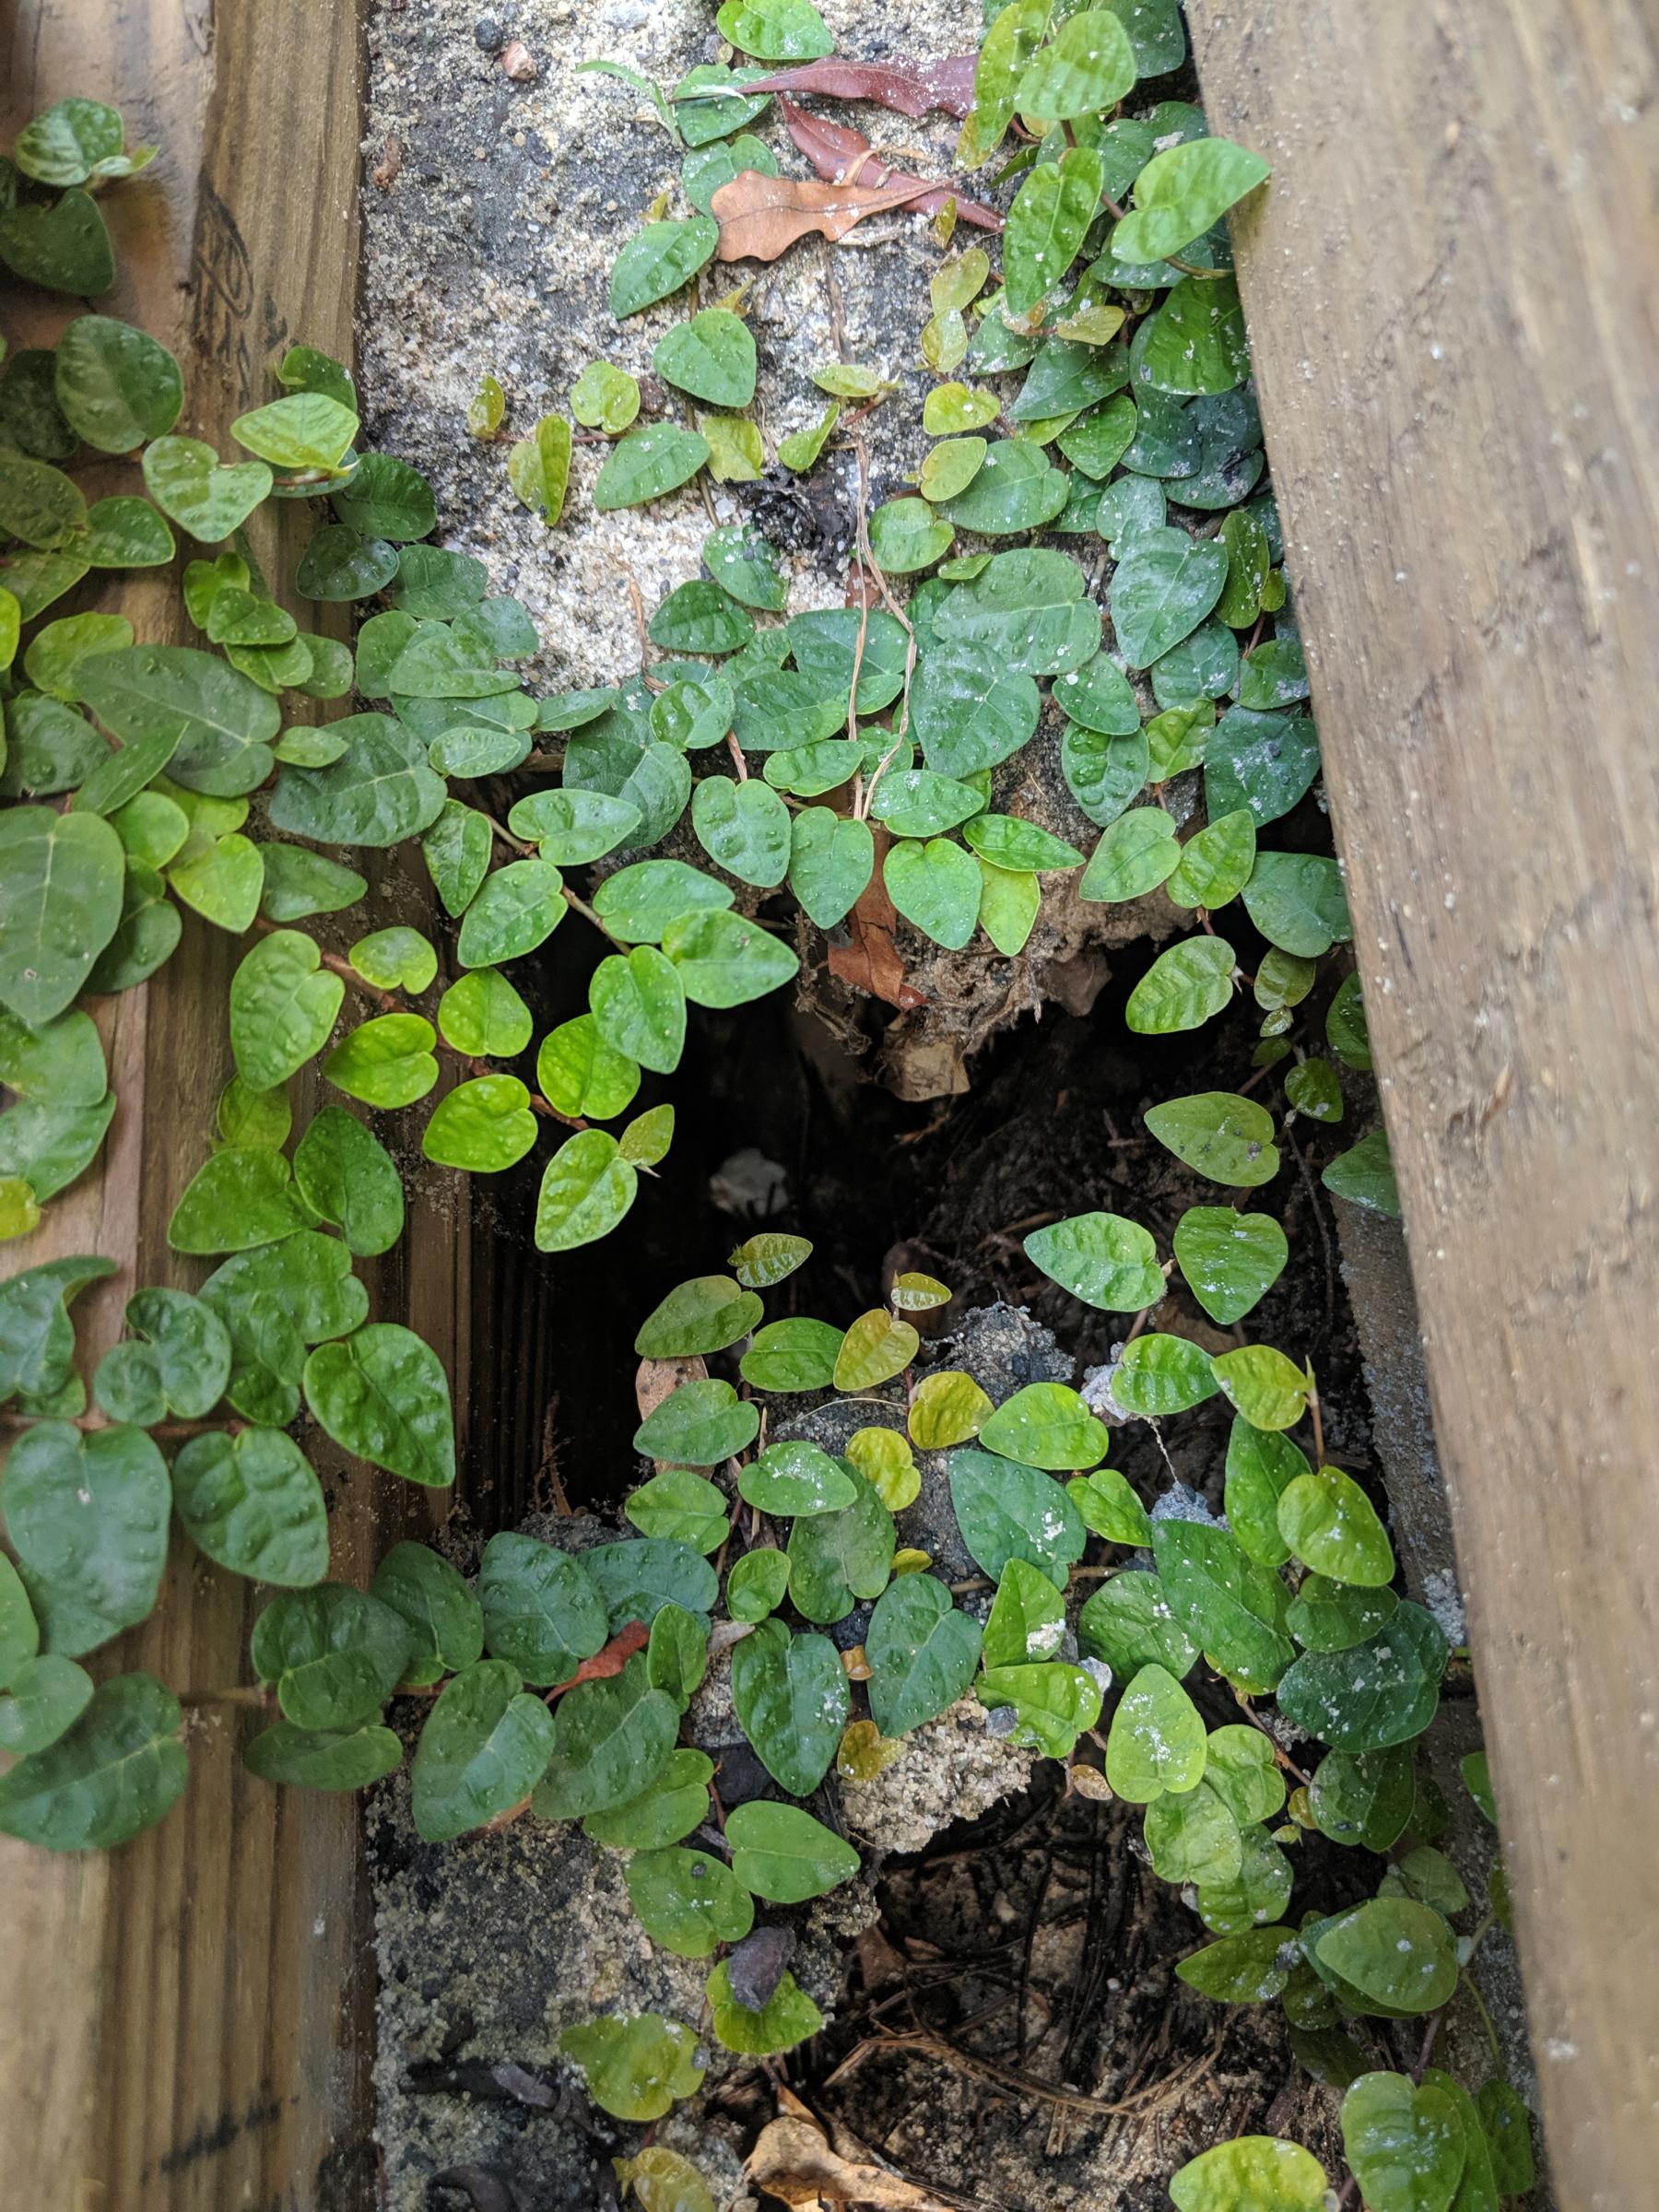 Timber retaining wall repair help-mvimg_20190715_172704.jpg